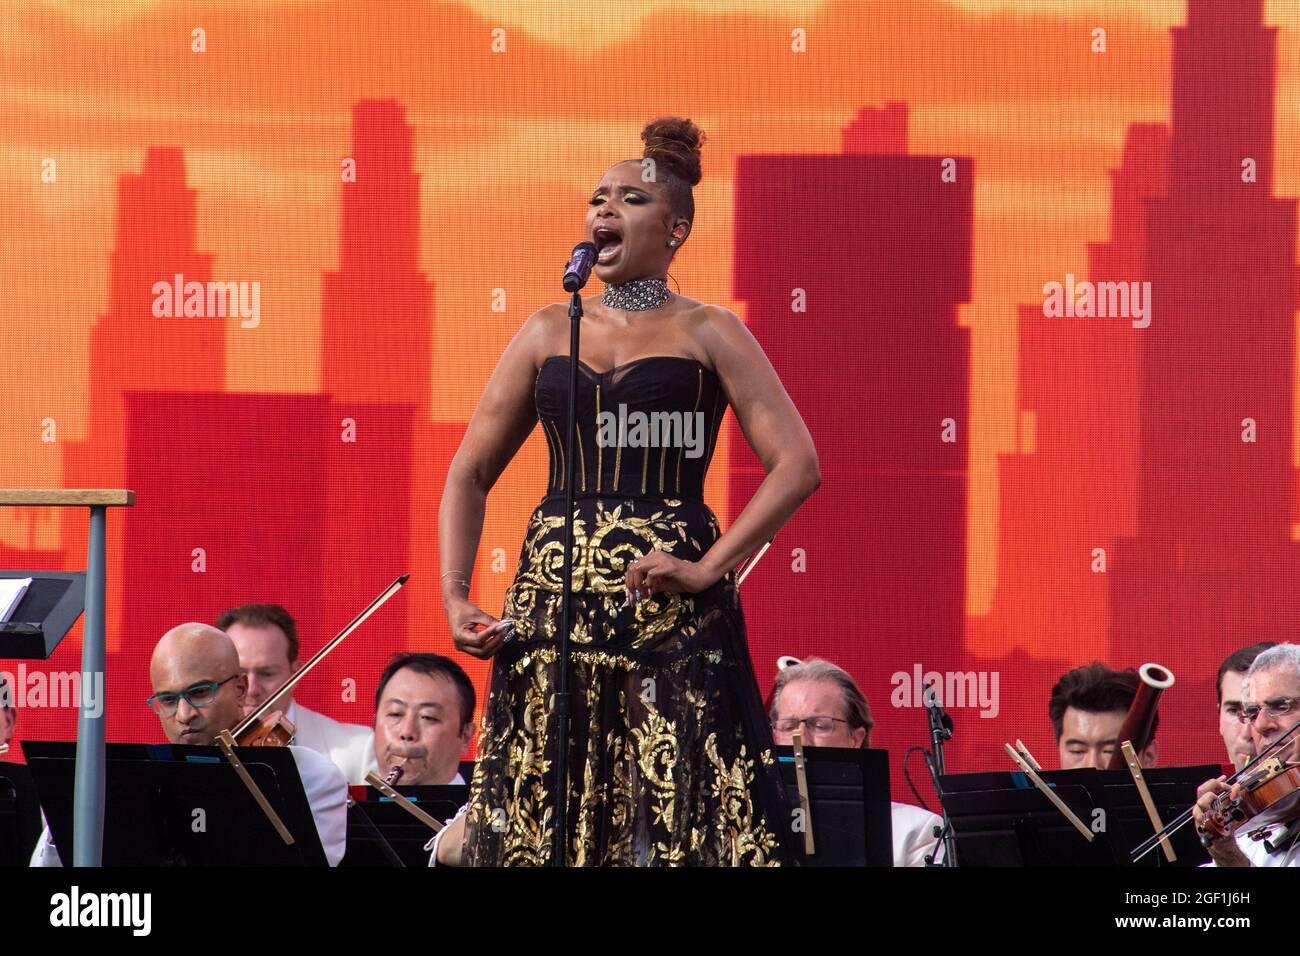 "NEW YORK, NY - AGOSTO 21: Il cantante Jennifer Hudson suona durante ""We Love NYC: The Homecoming Concert"" al Great Lawn in Central Park il 21 Agosto 2021 a New York City. Foto Stock"